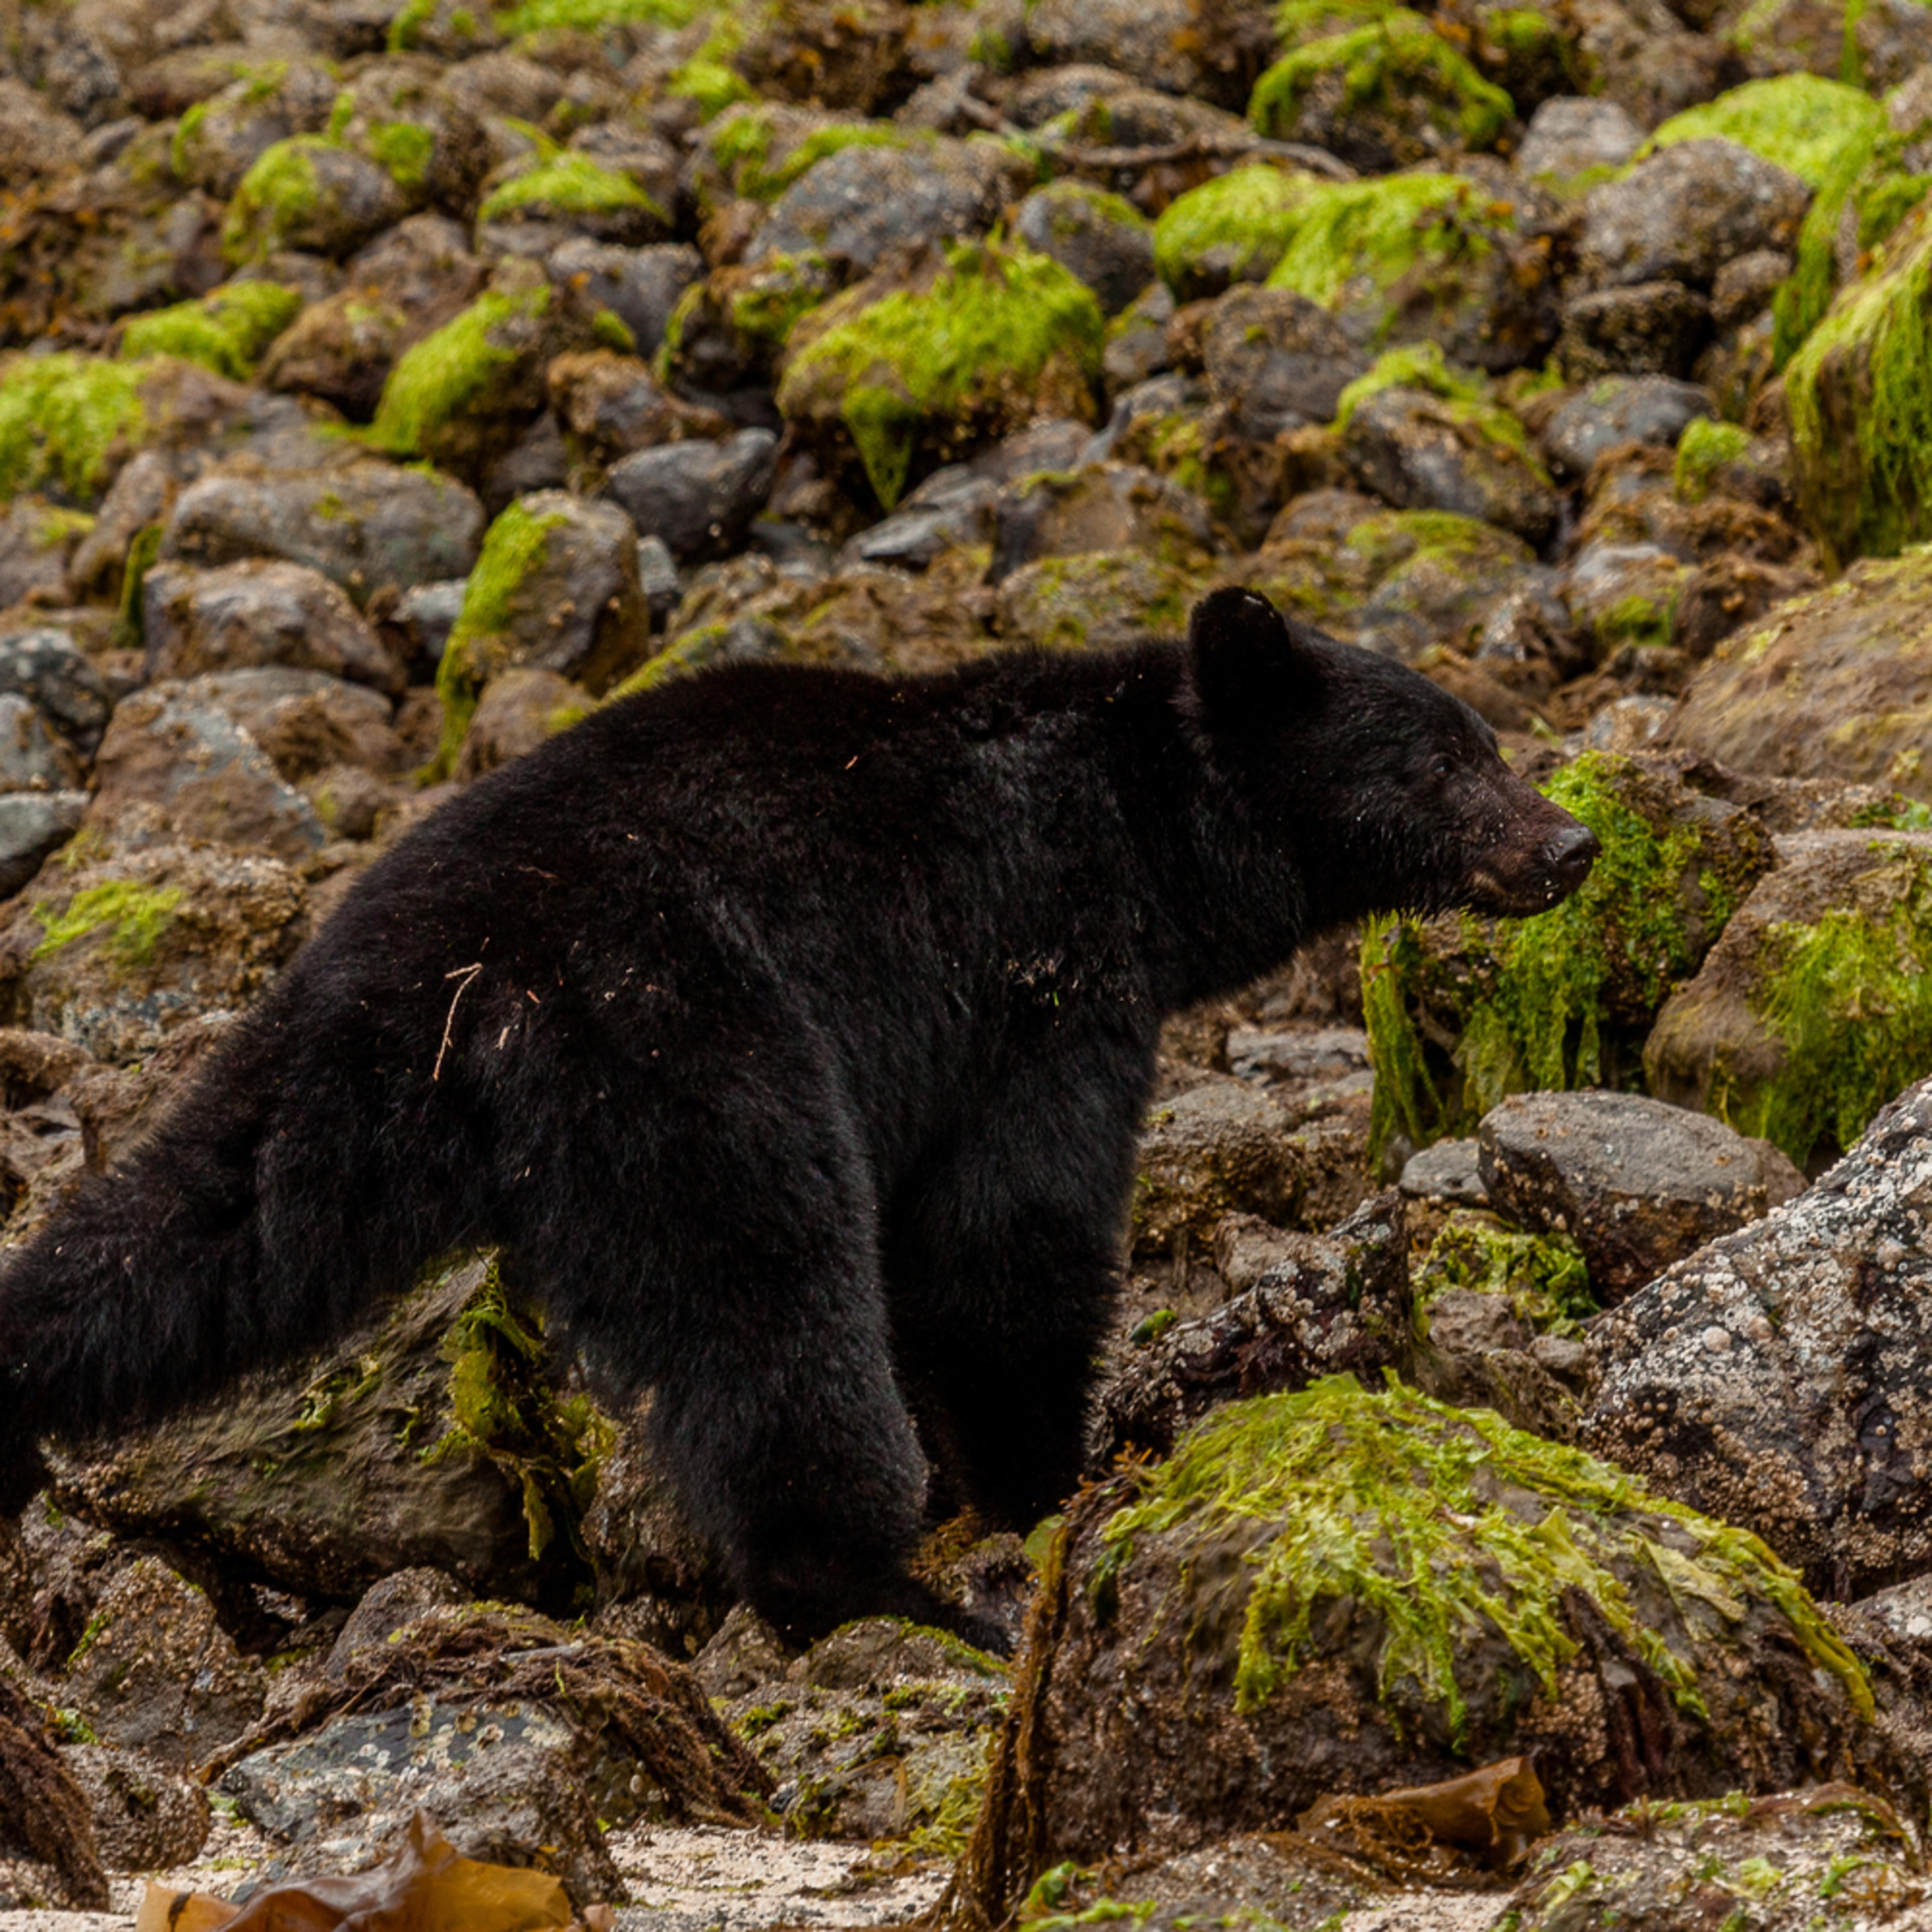 Black bear walk vbhqdz